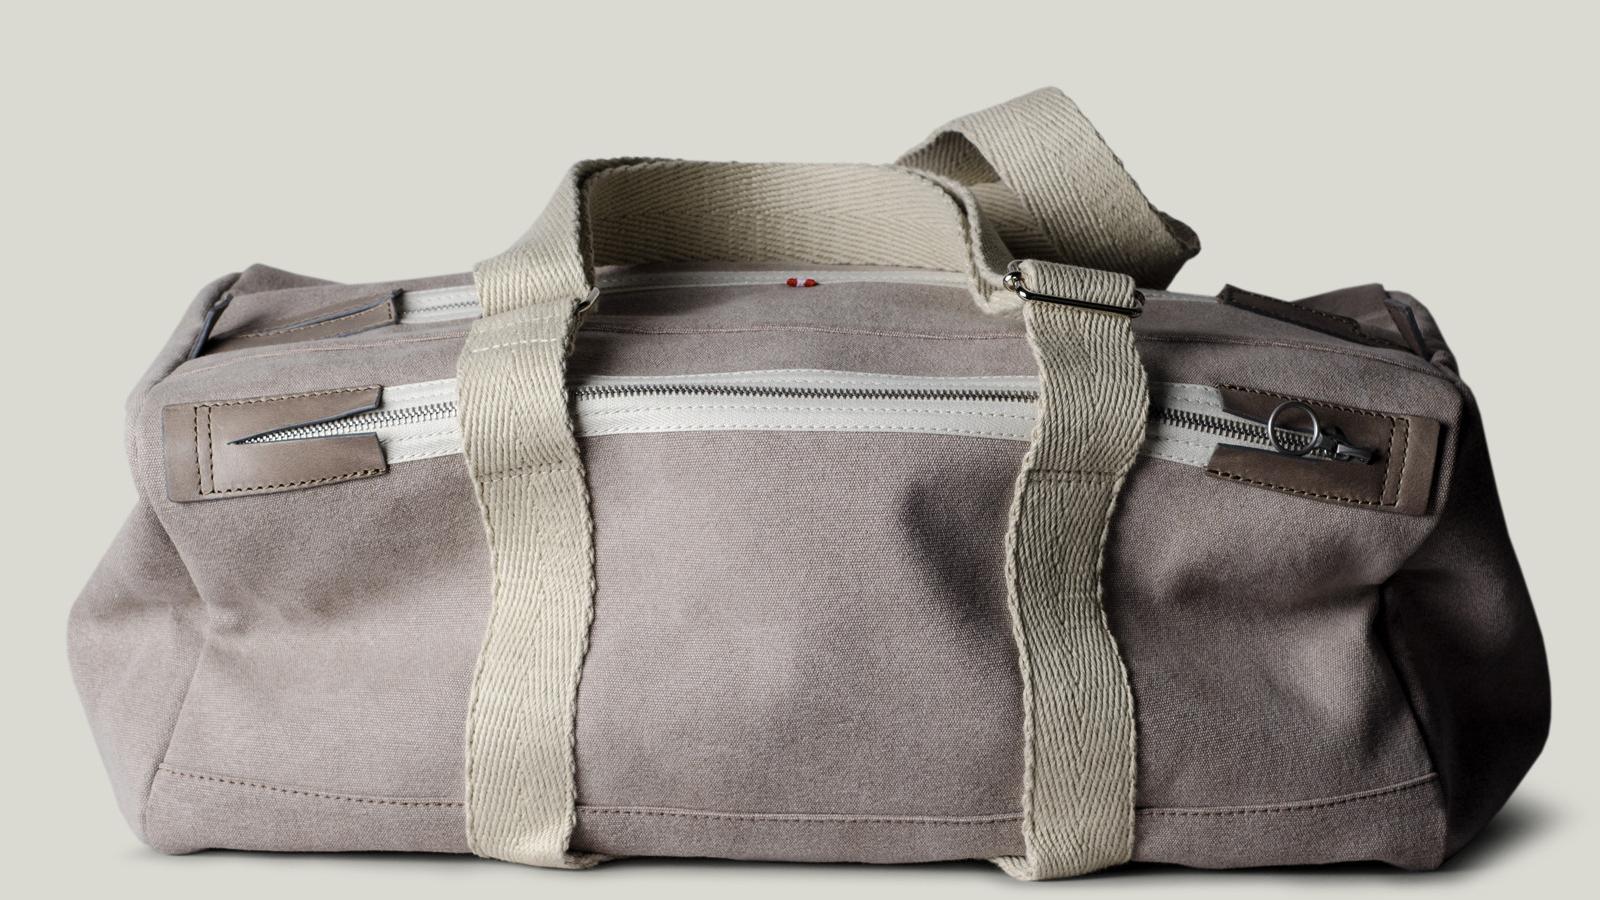 Hardgraft Game Gym Bag Off Grey | best mens gym duffle bag